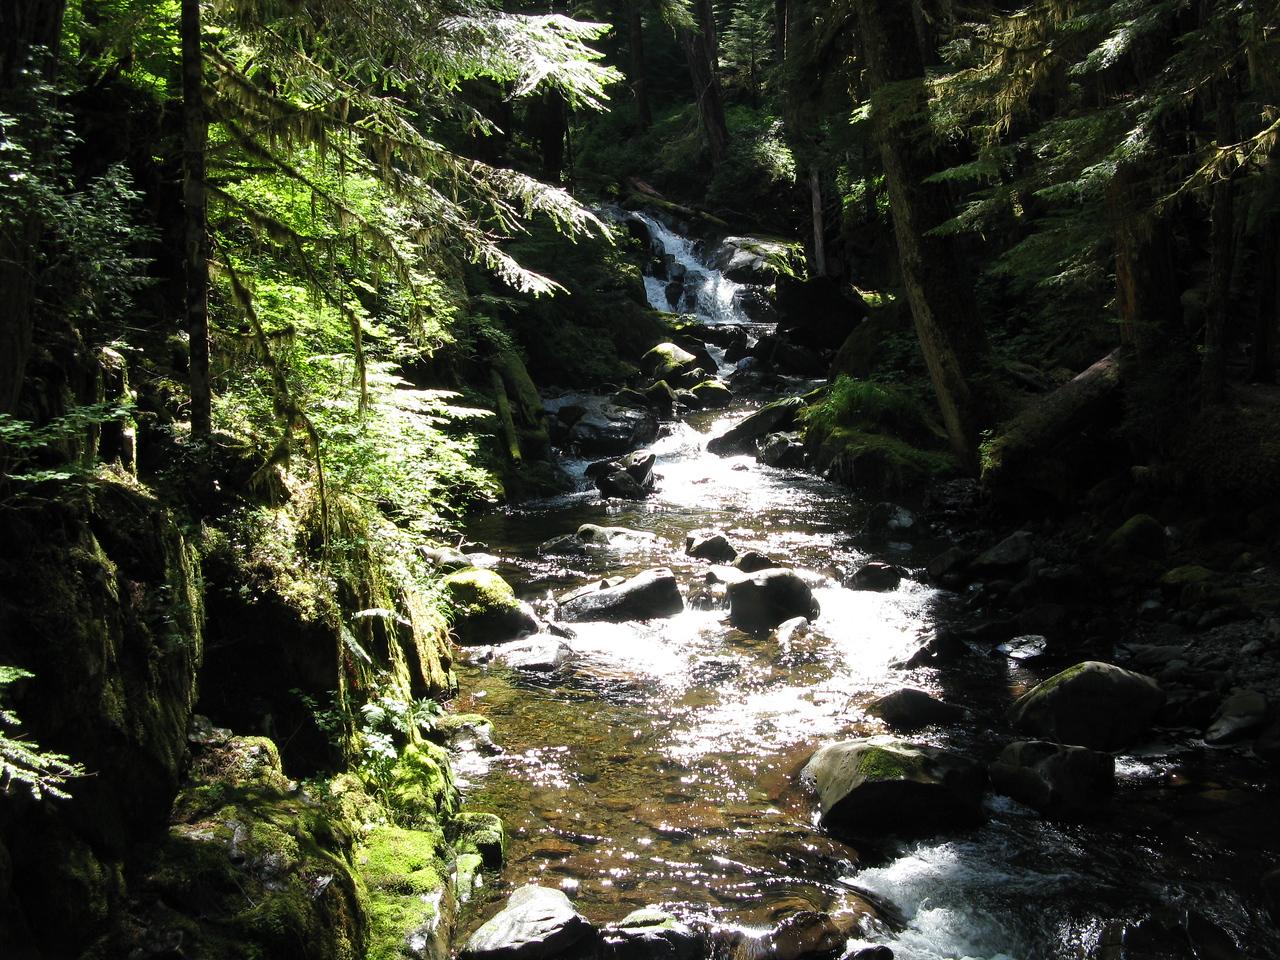 A creek coming down the hillside.